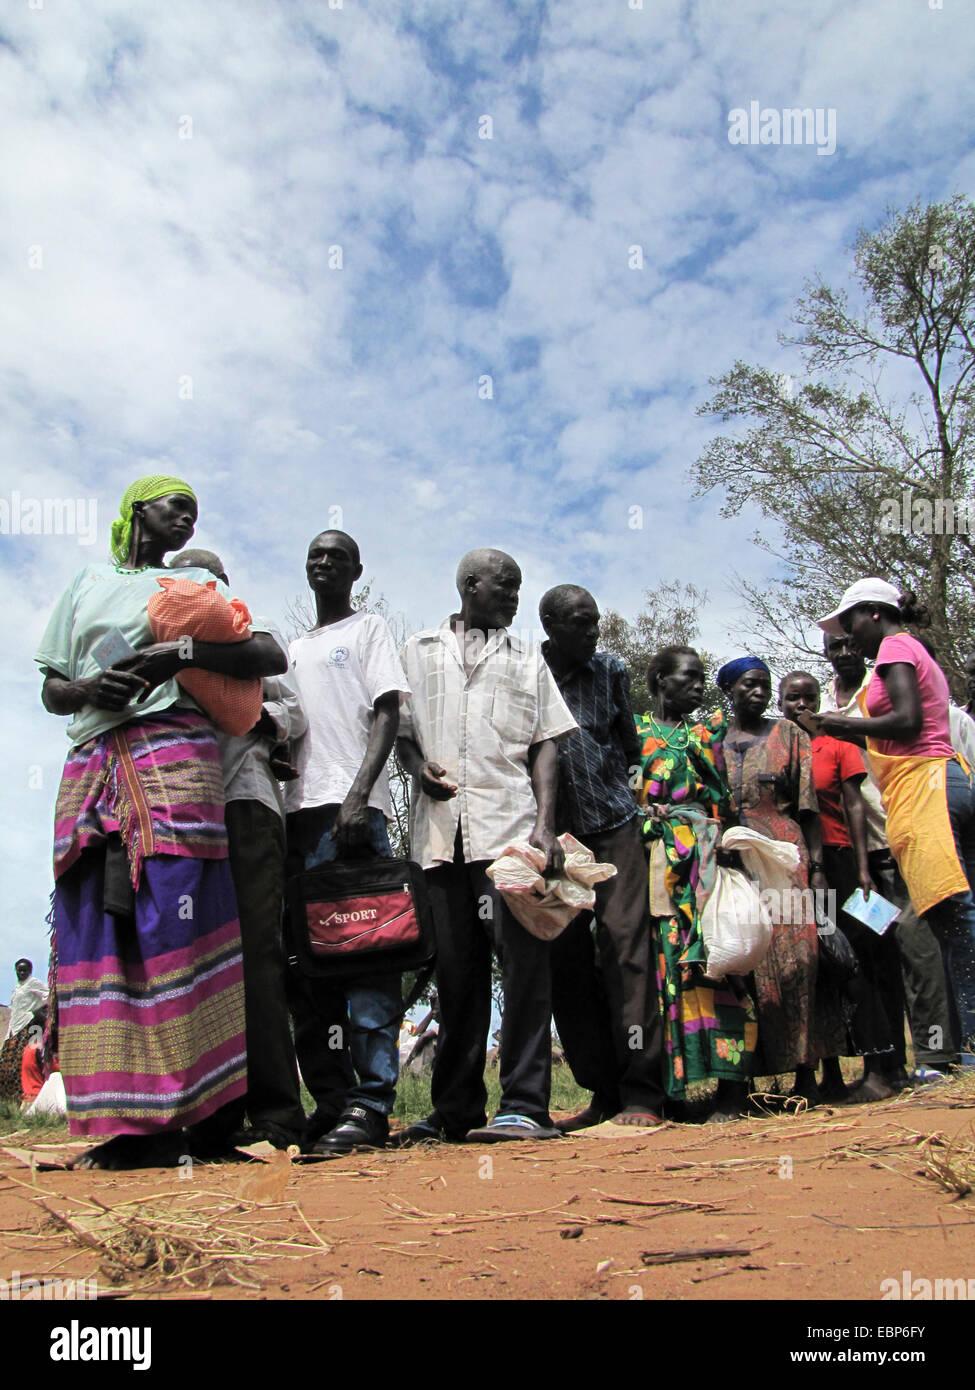 Refugee camp for internally displaced people in northern Uganda around Gulu, the non-governmental organisation 'Norwegian - Stock Image